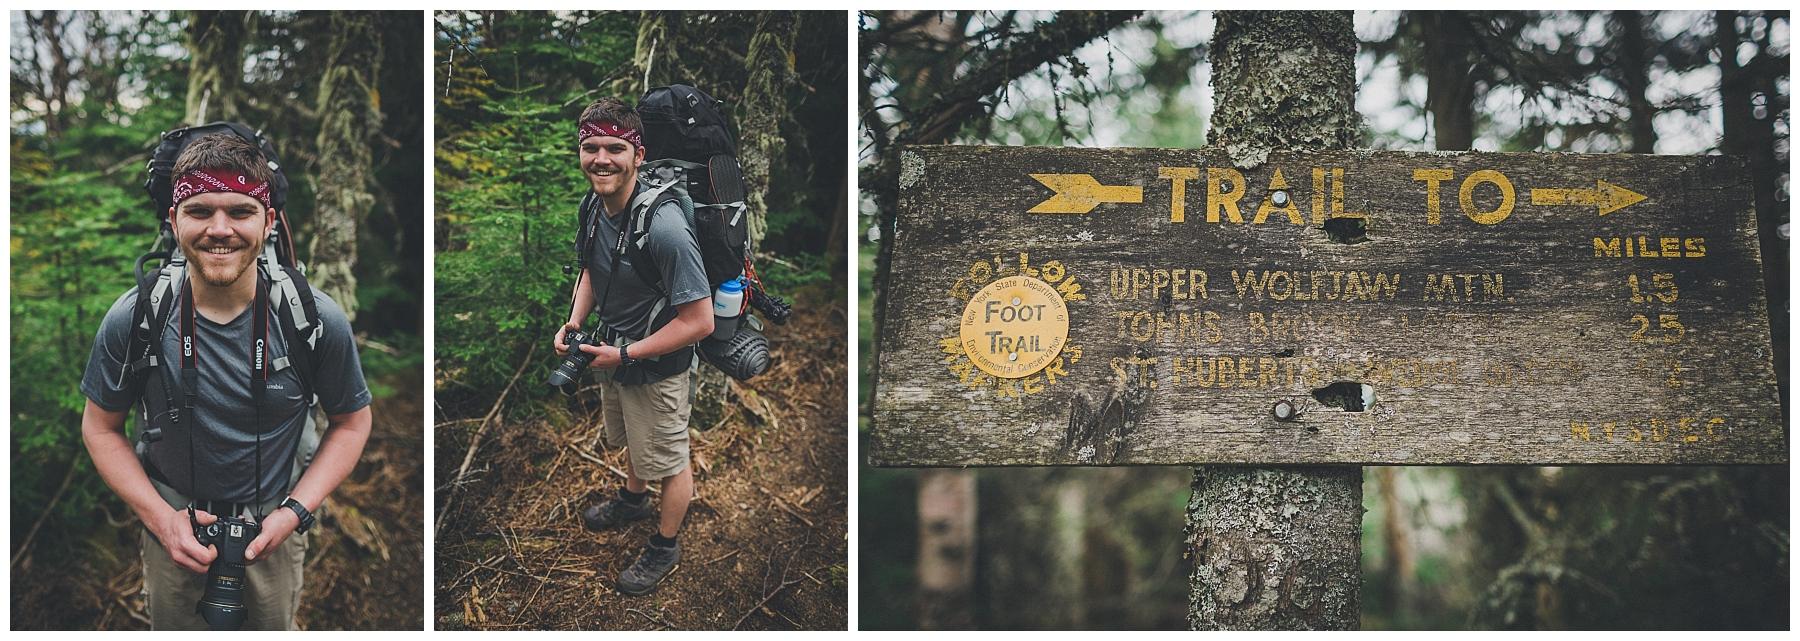 Mid-trail portraits